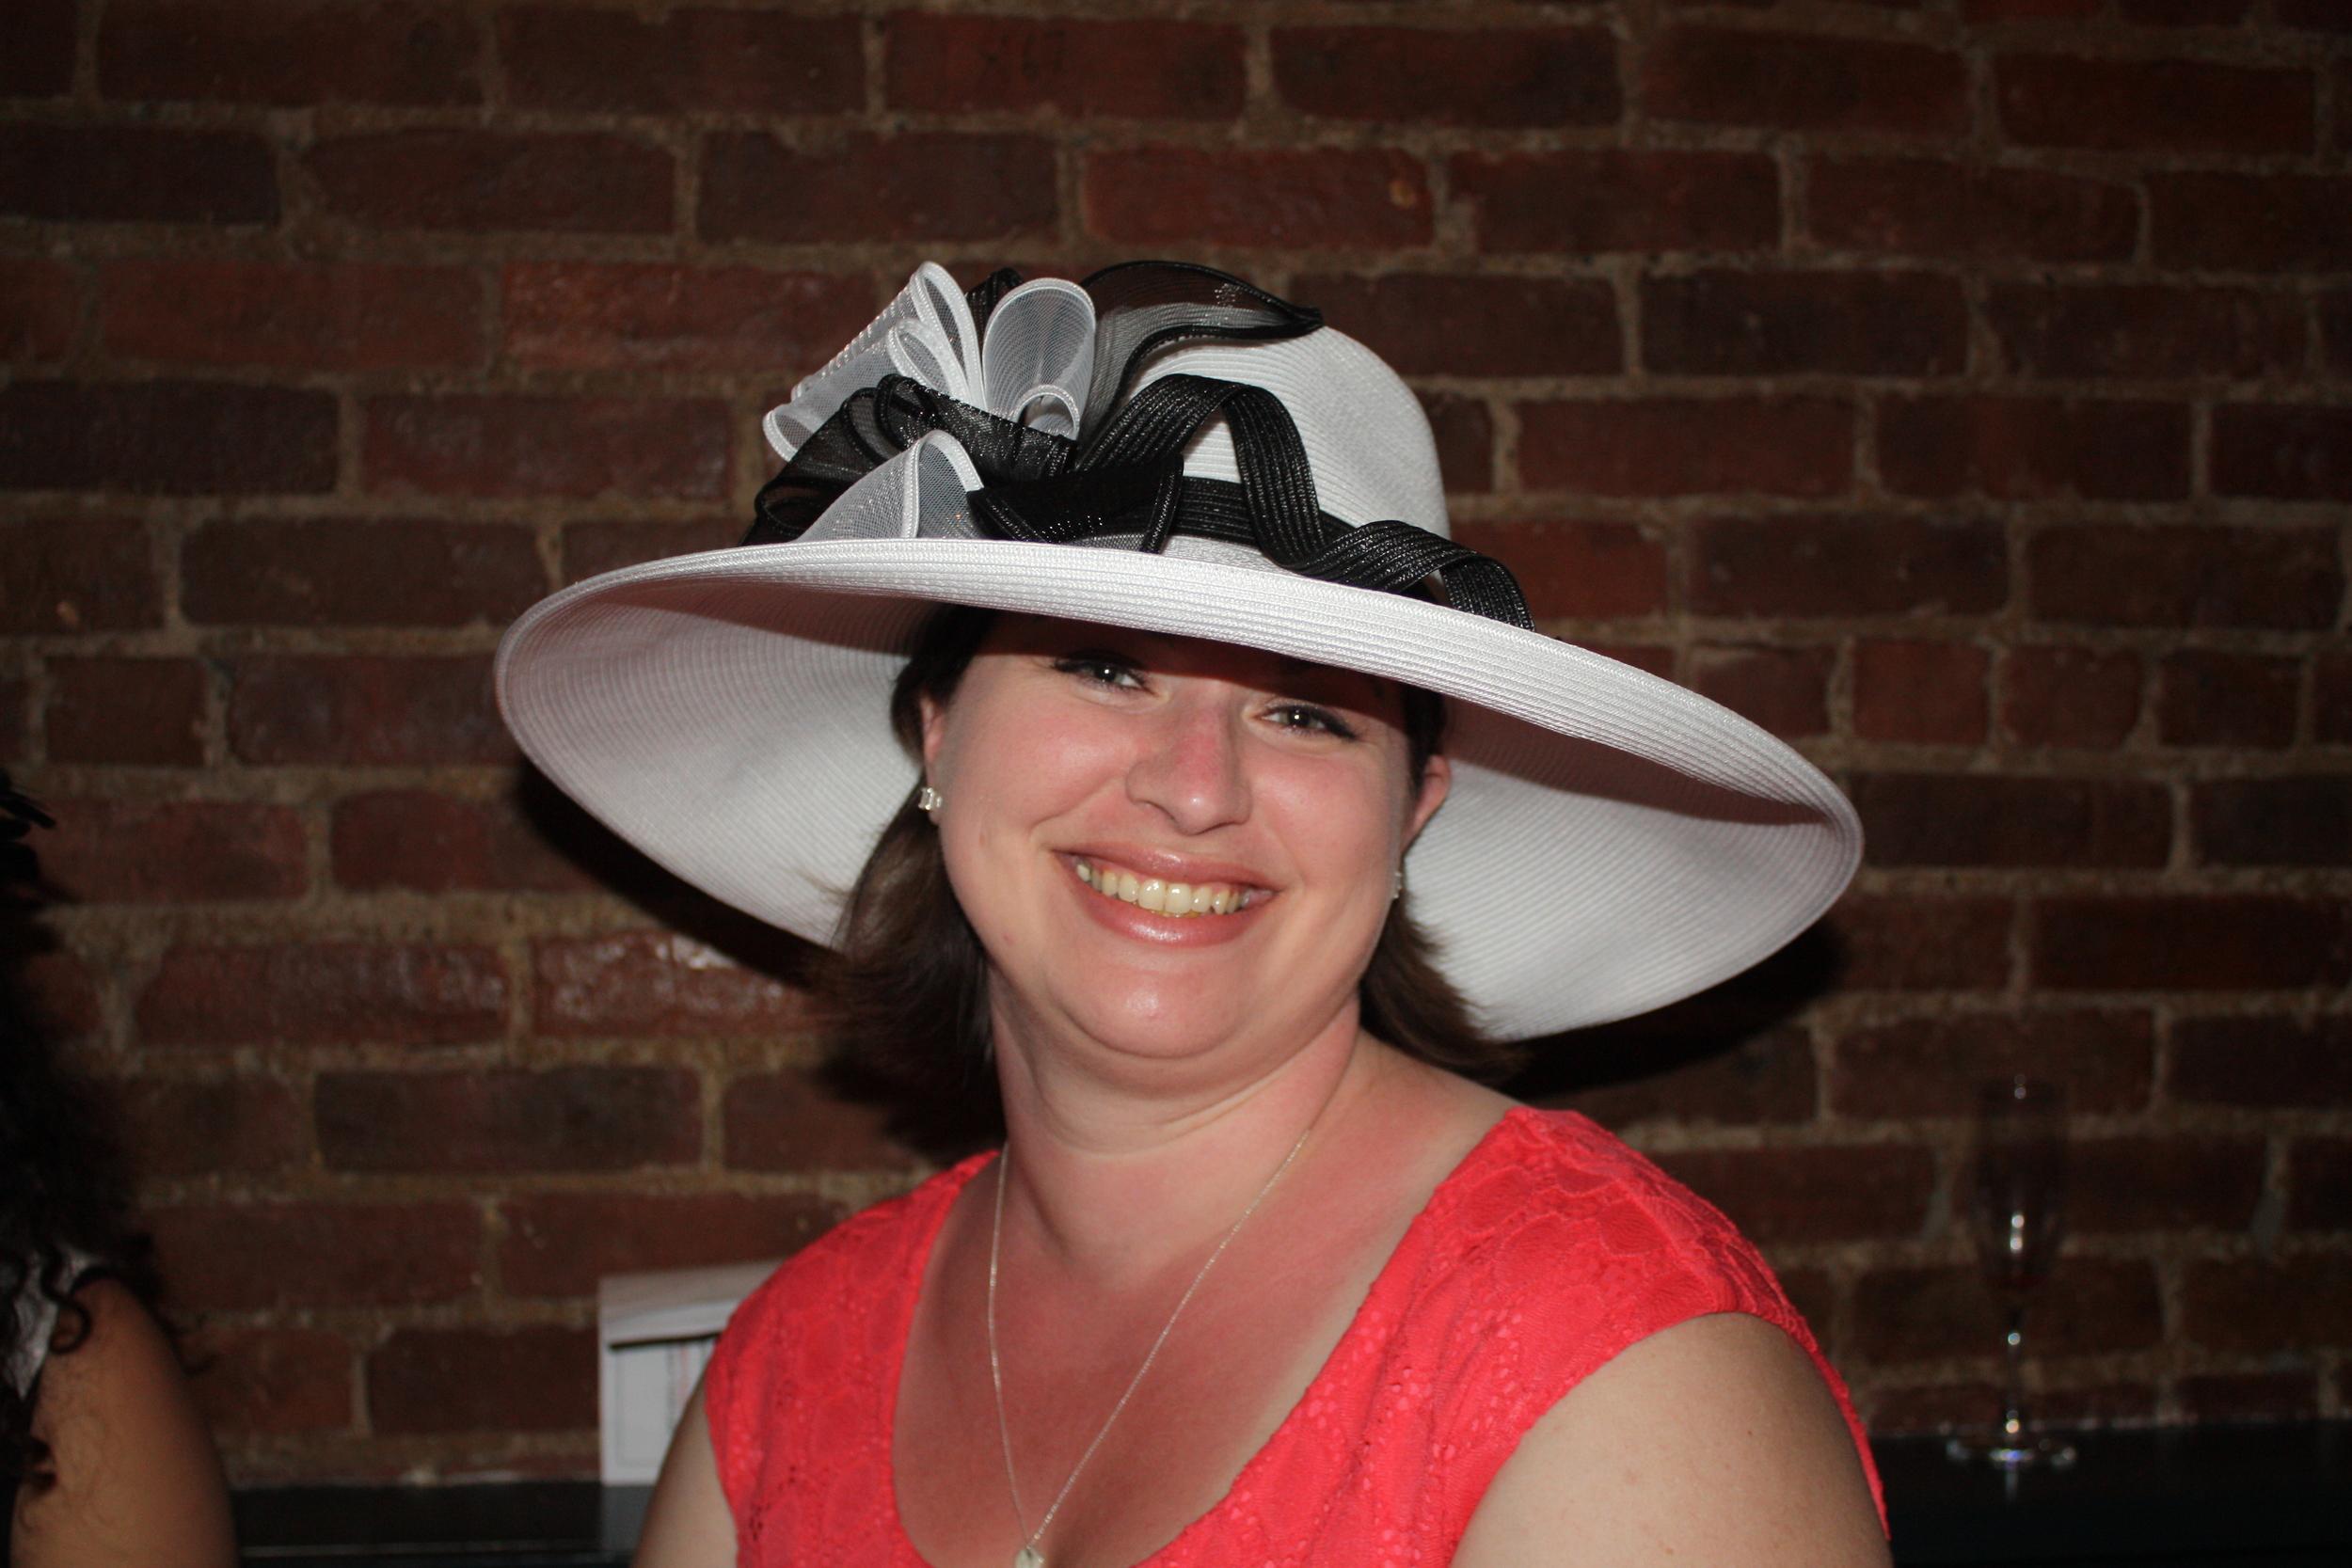 New Friends in hats